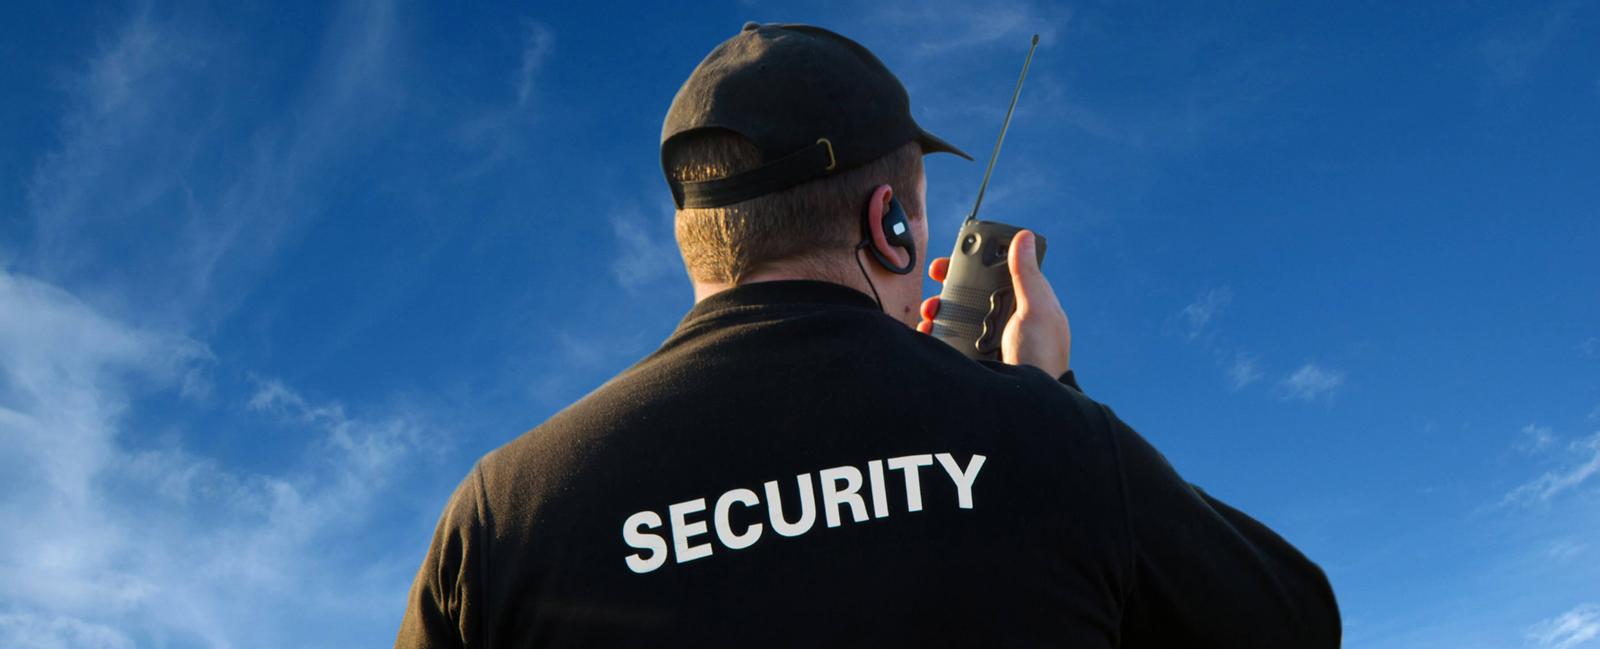 Bodyguard Services Dubai